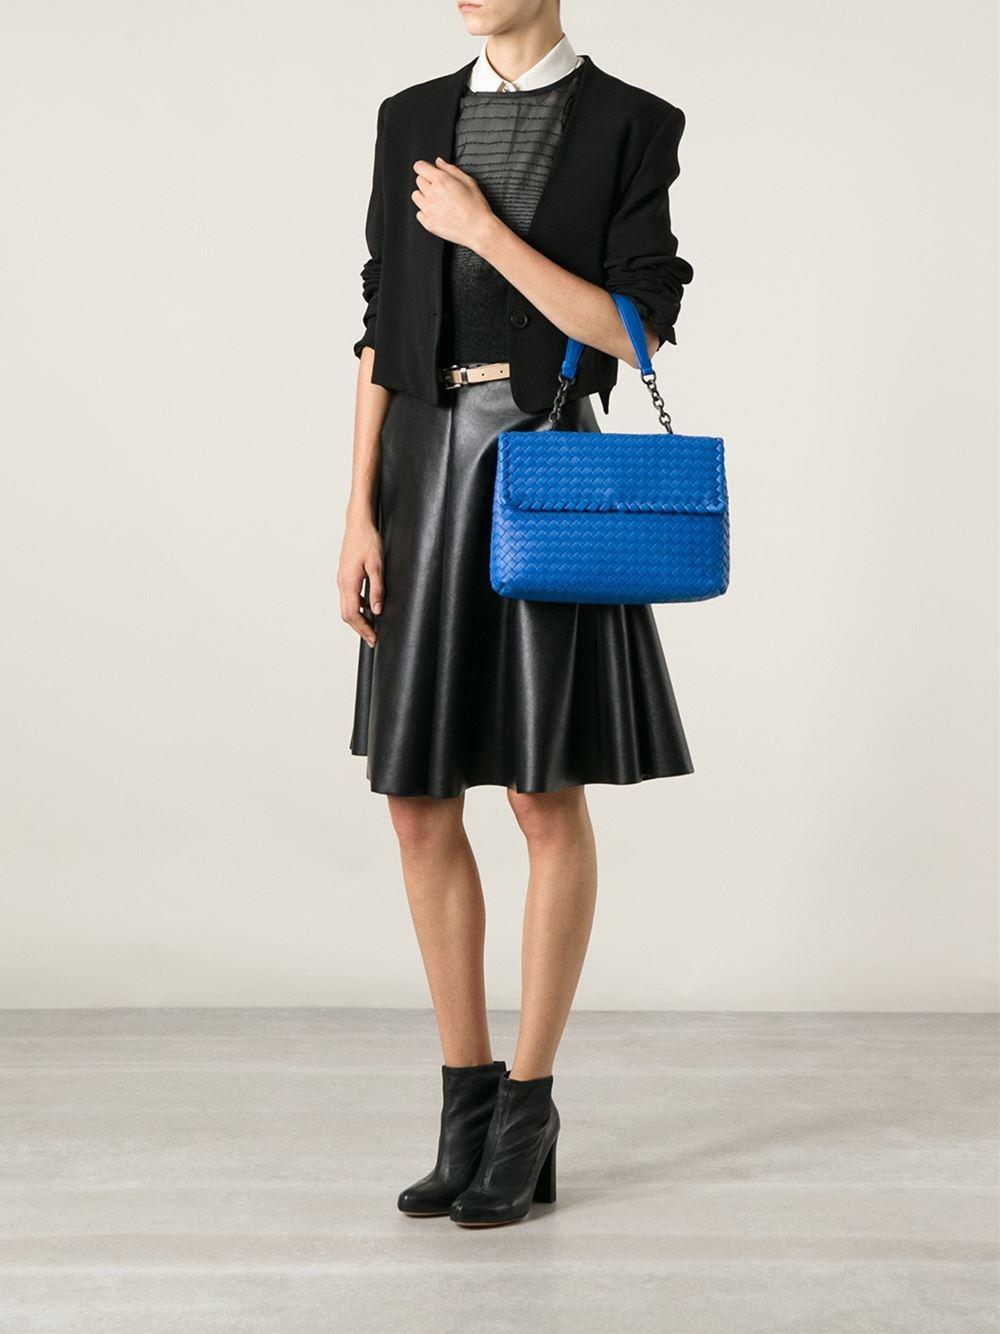 e4b30a897343 Bottega Veneta Intrecciato Olimpia Shoulder Bag in Blue - Lyst